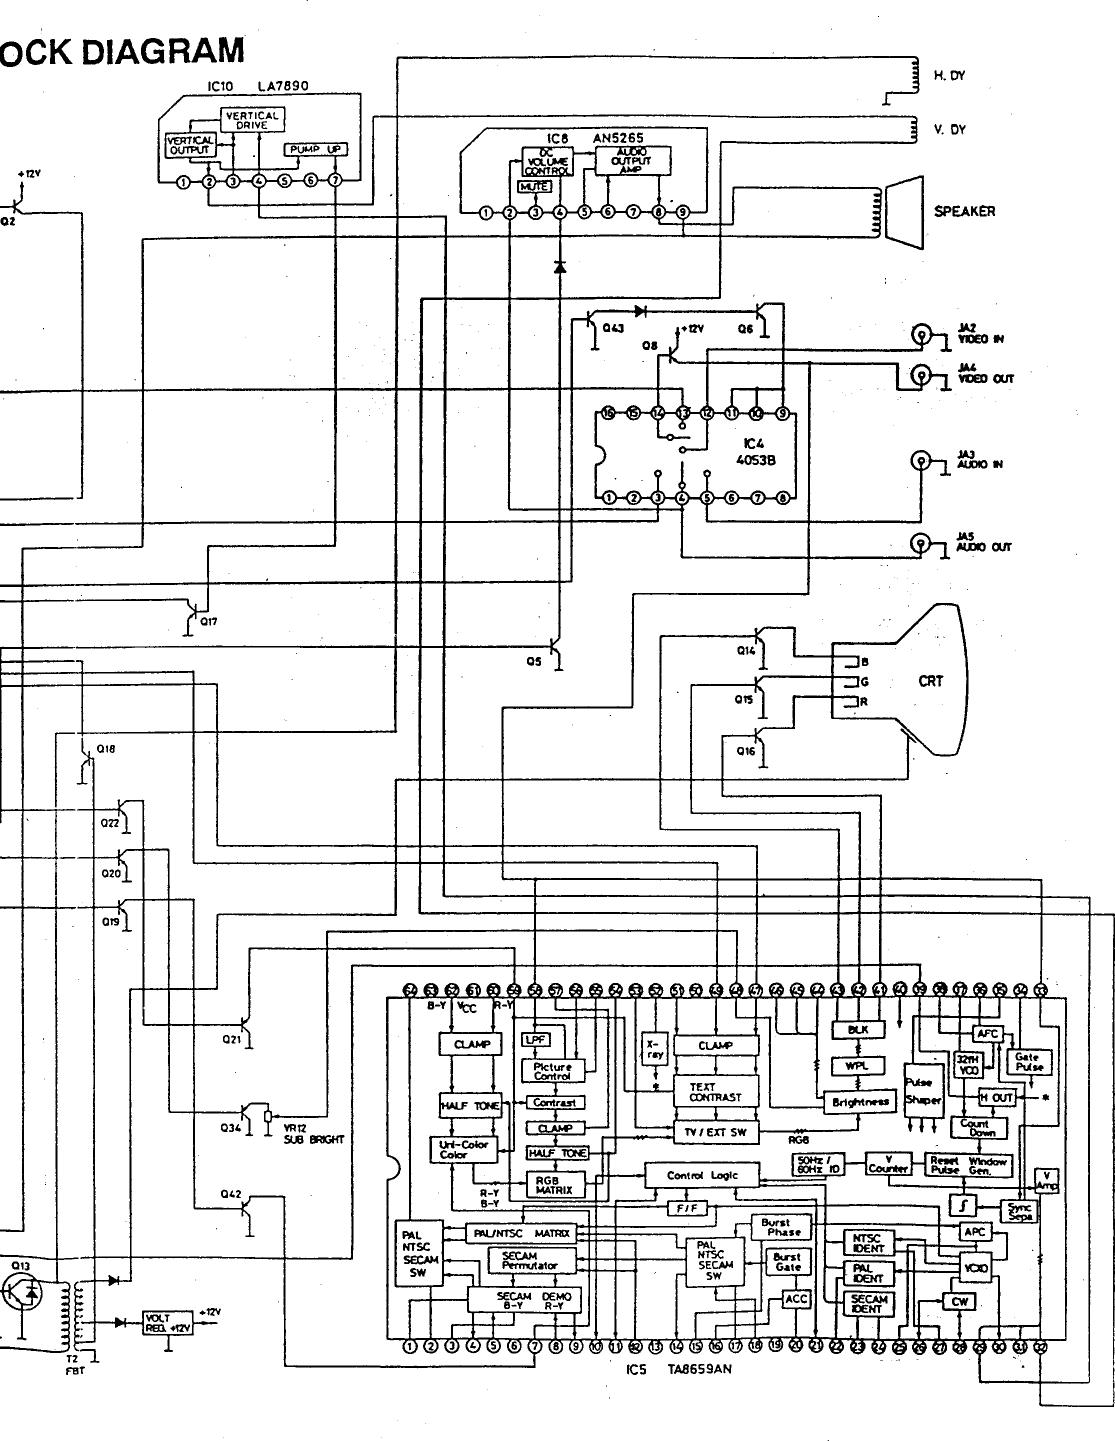 Funai Tv Schematic Diagram. . Wiring Diagram on